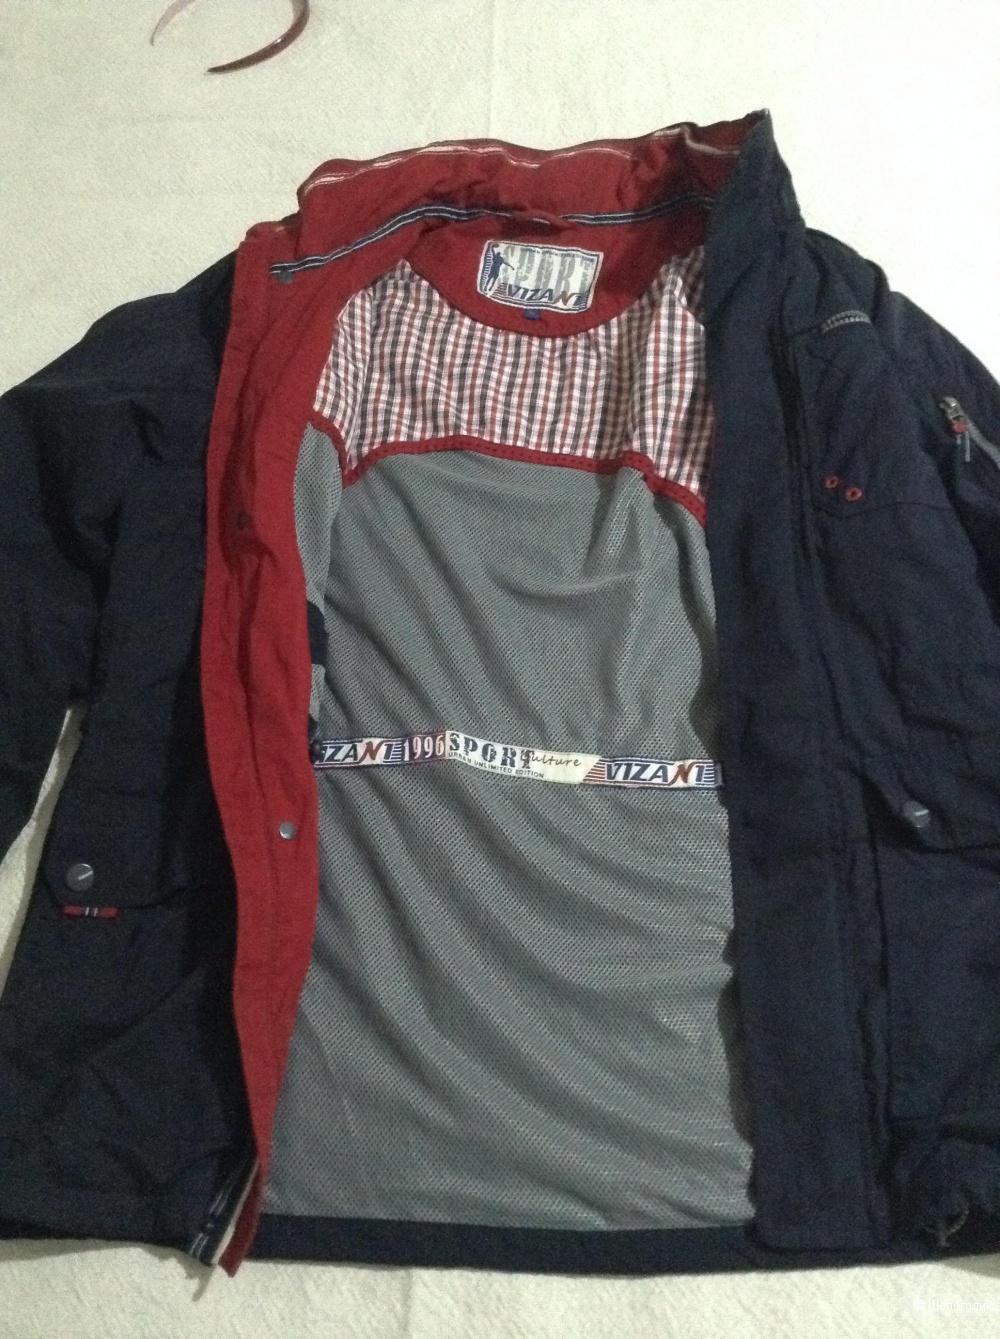 Куртка Vizan 1 размер 50-52